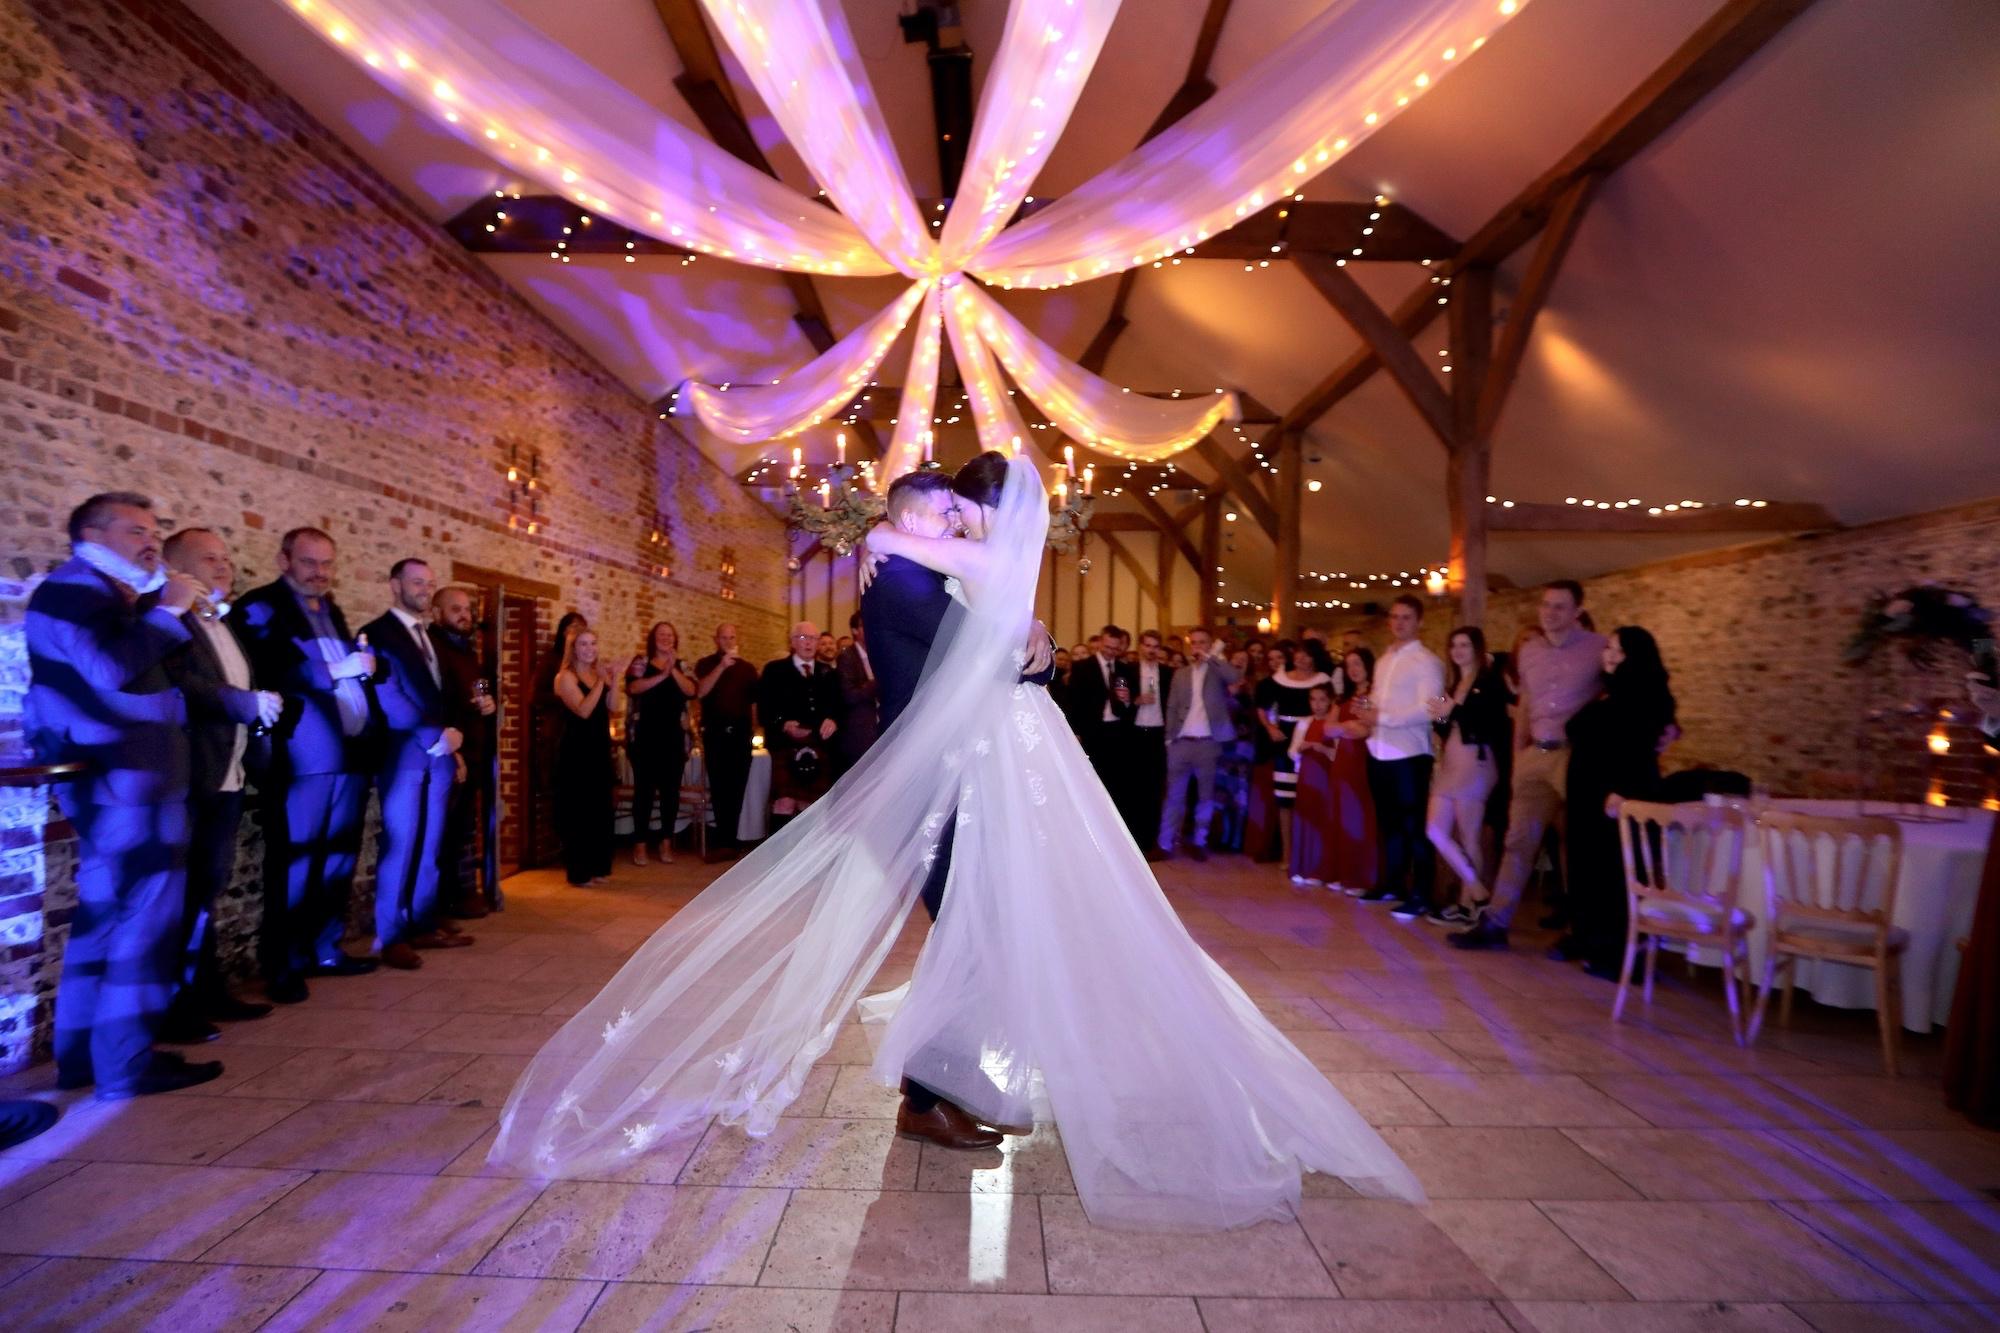 wedding photographer fist dance upwaltham barns